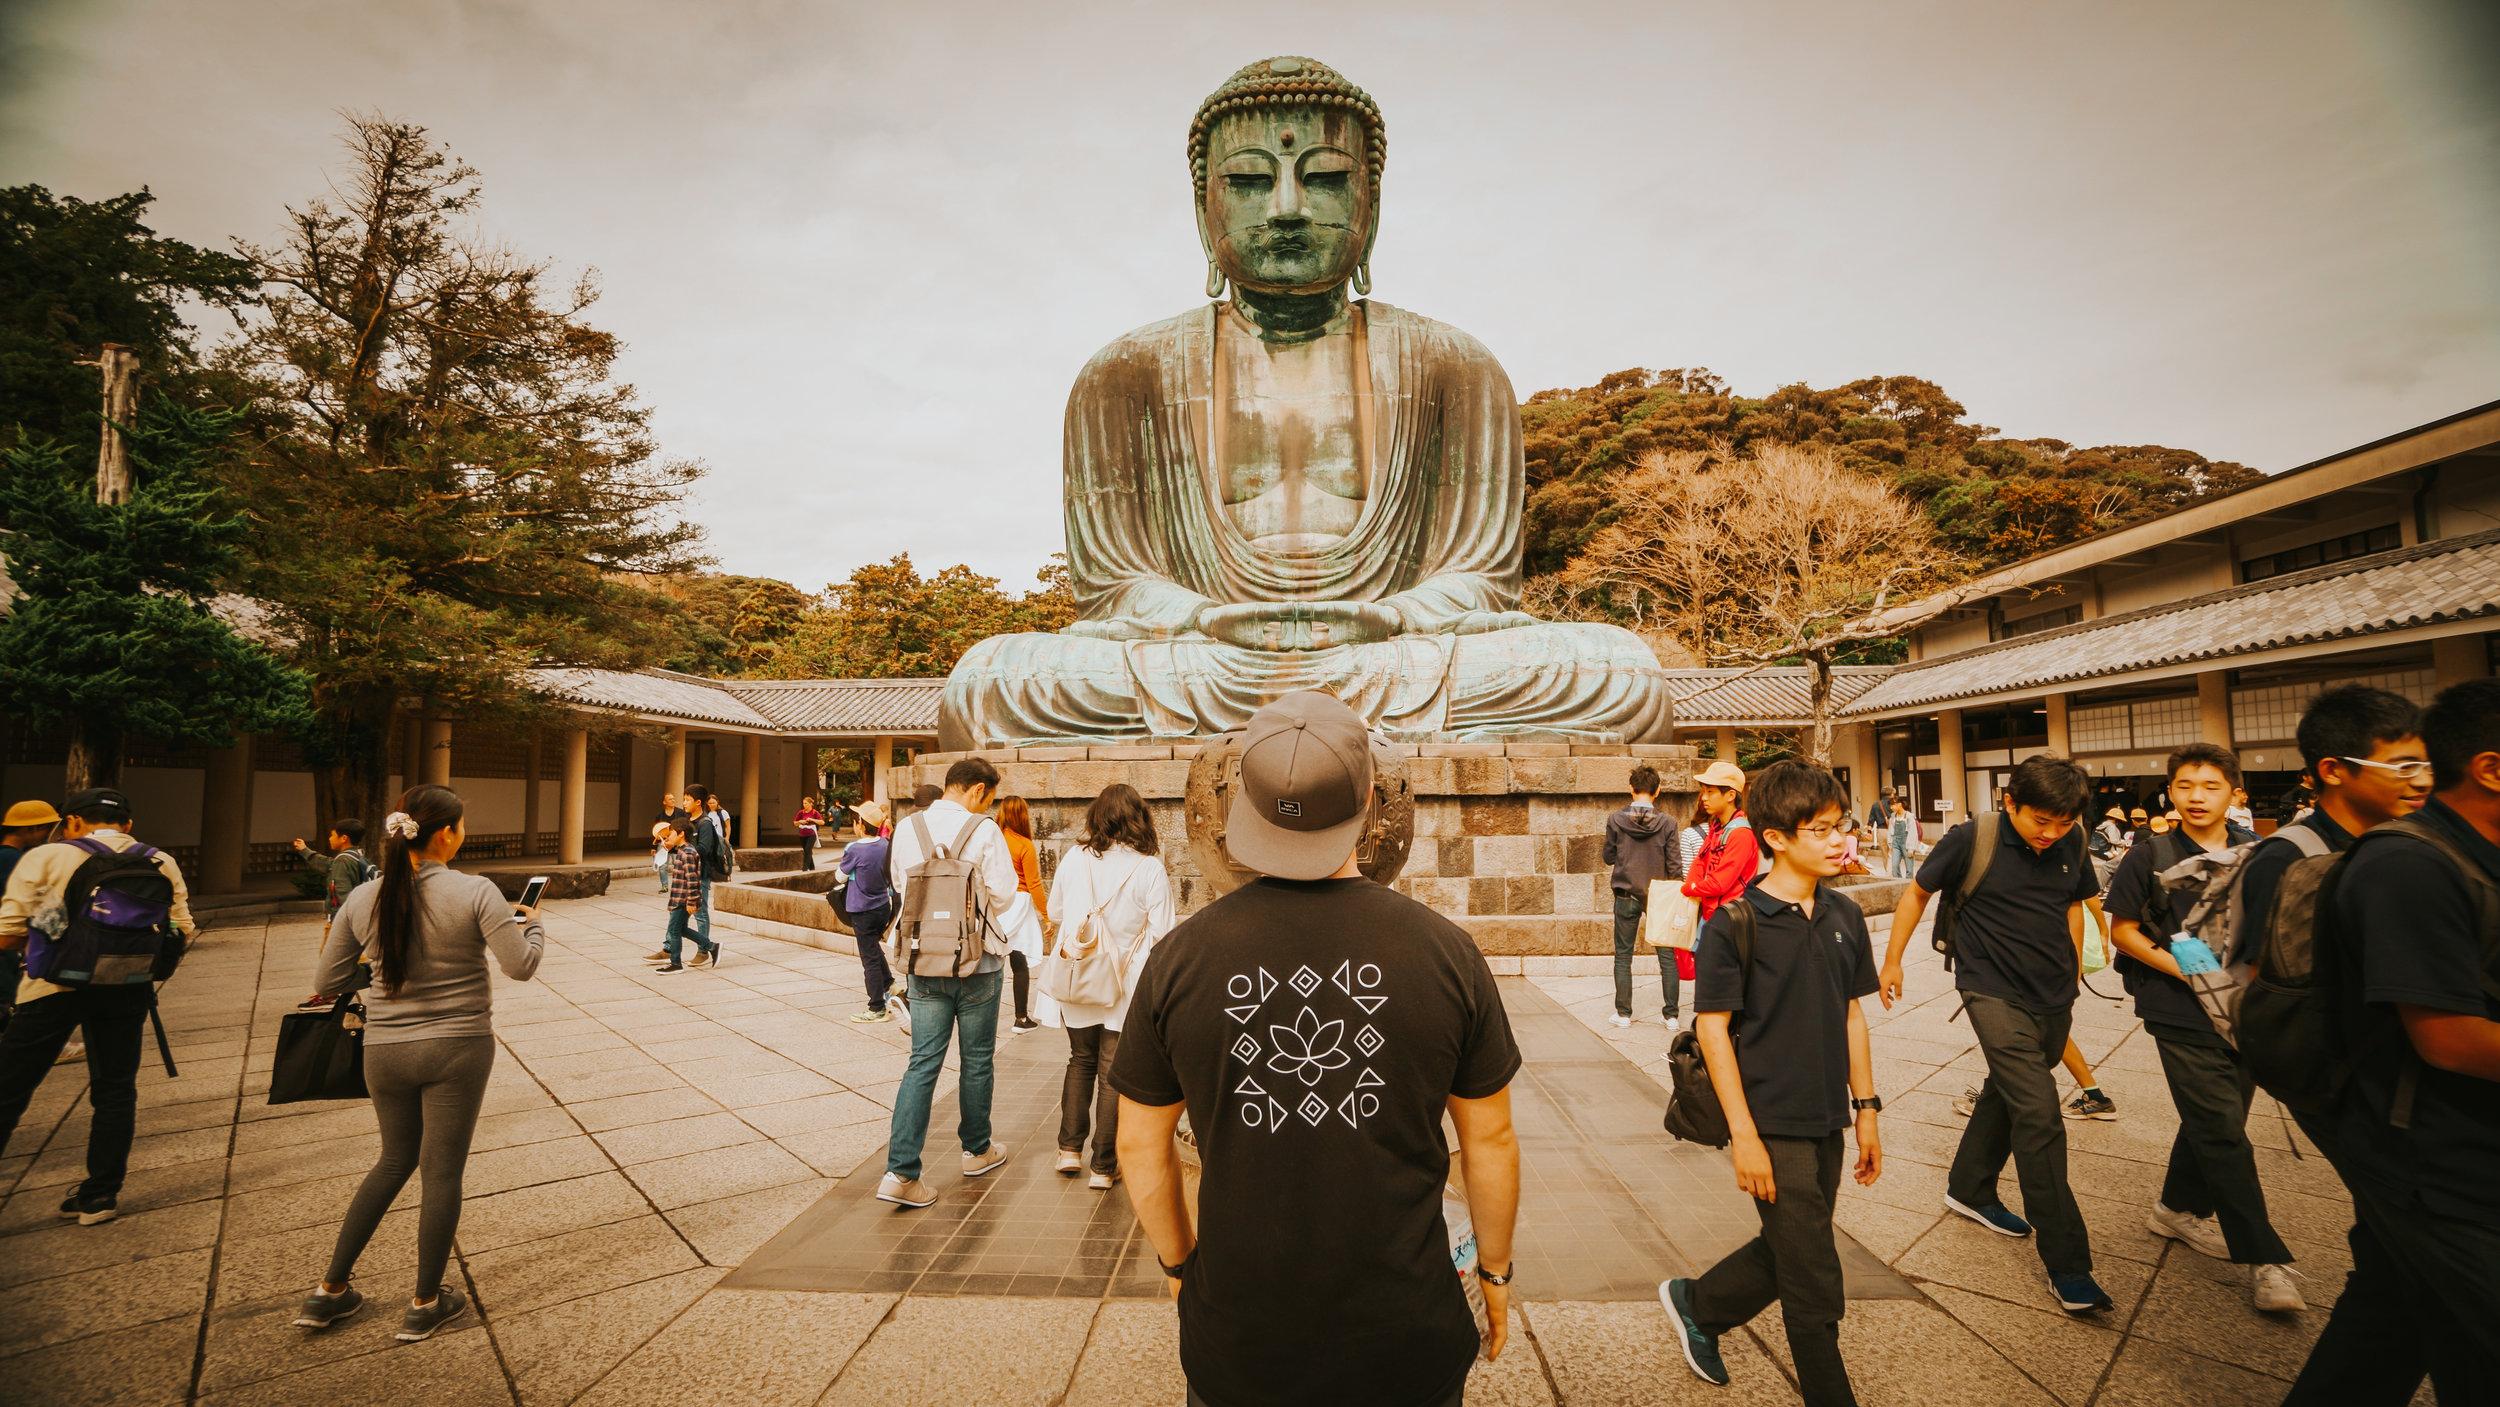 best-places-to-see-in-kamakura-kotokuin-temple-daibutsu-polywander